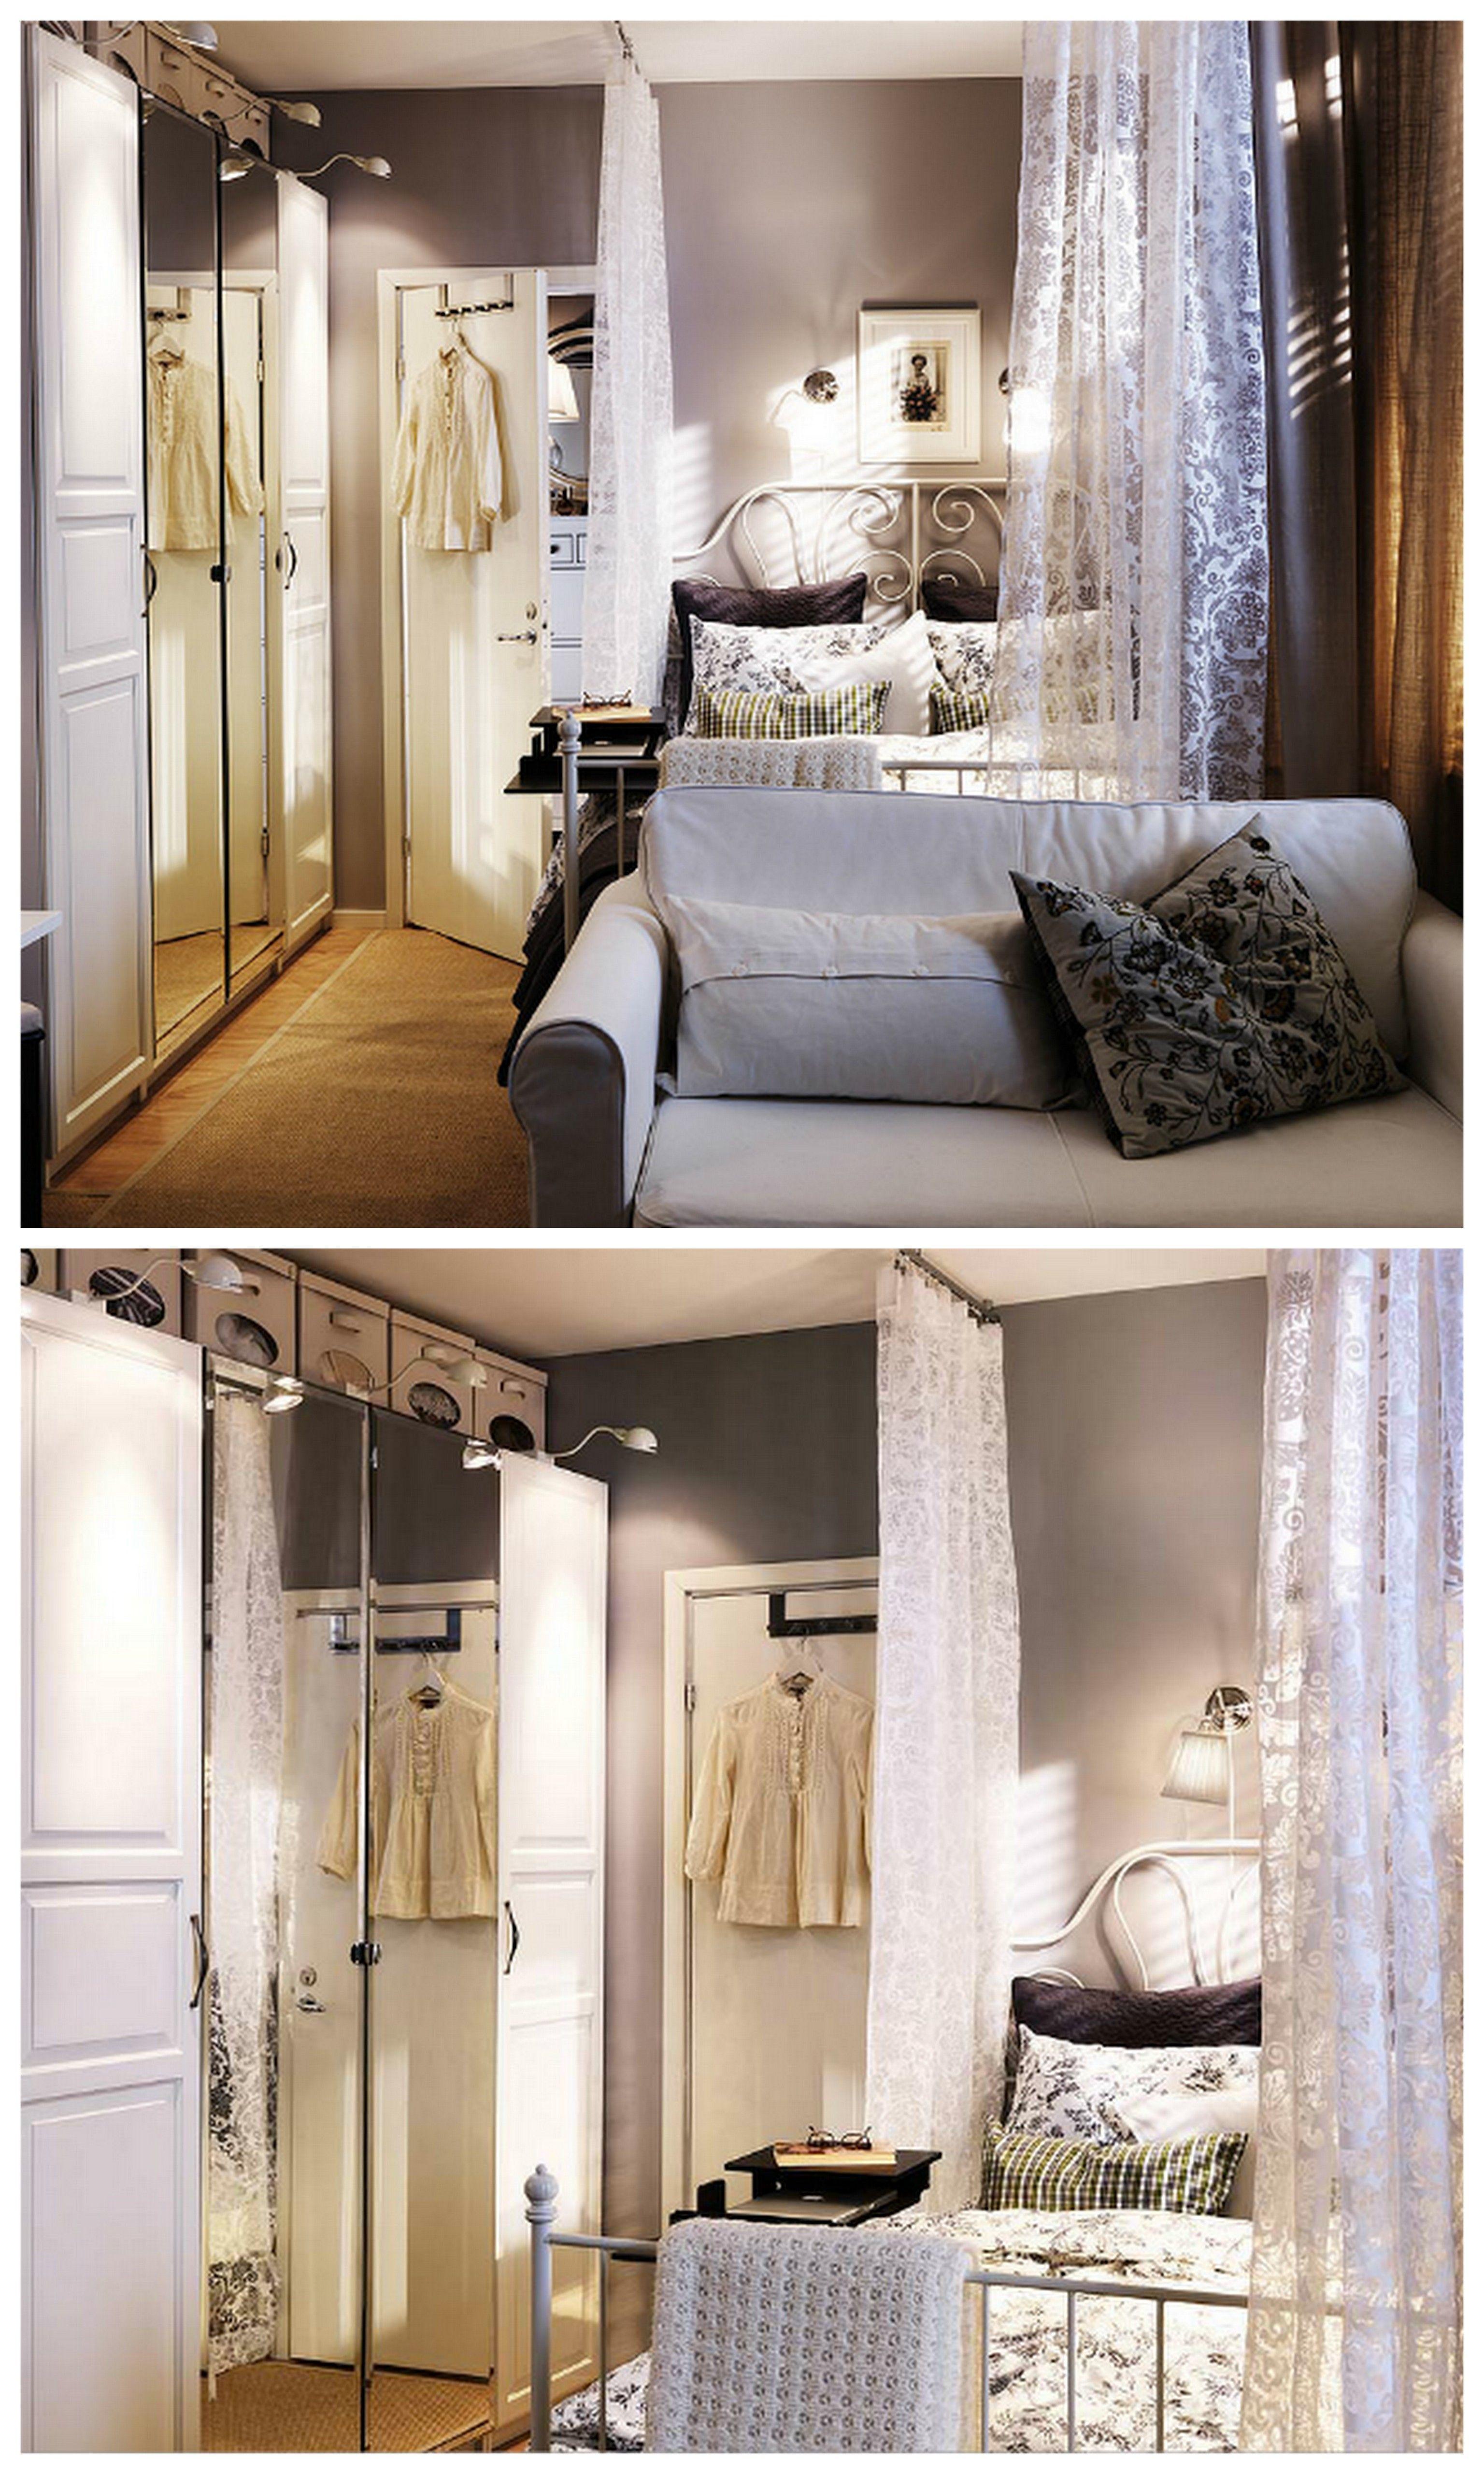 IKEA Liervik bed. Photos from IKEA catalog.   Bedrooms   Pinterest